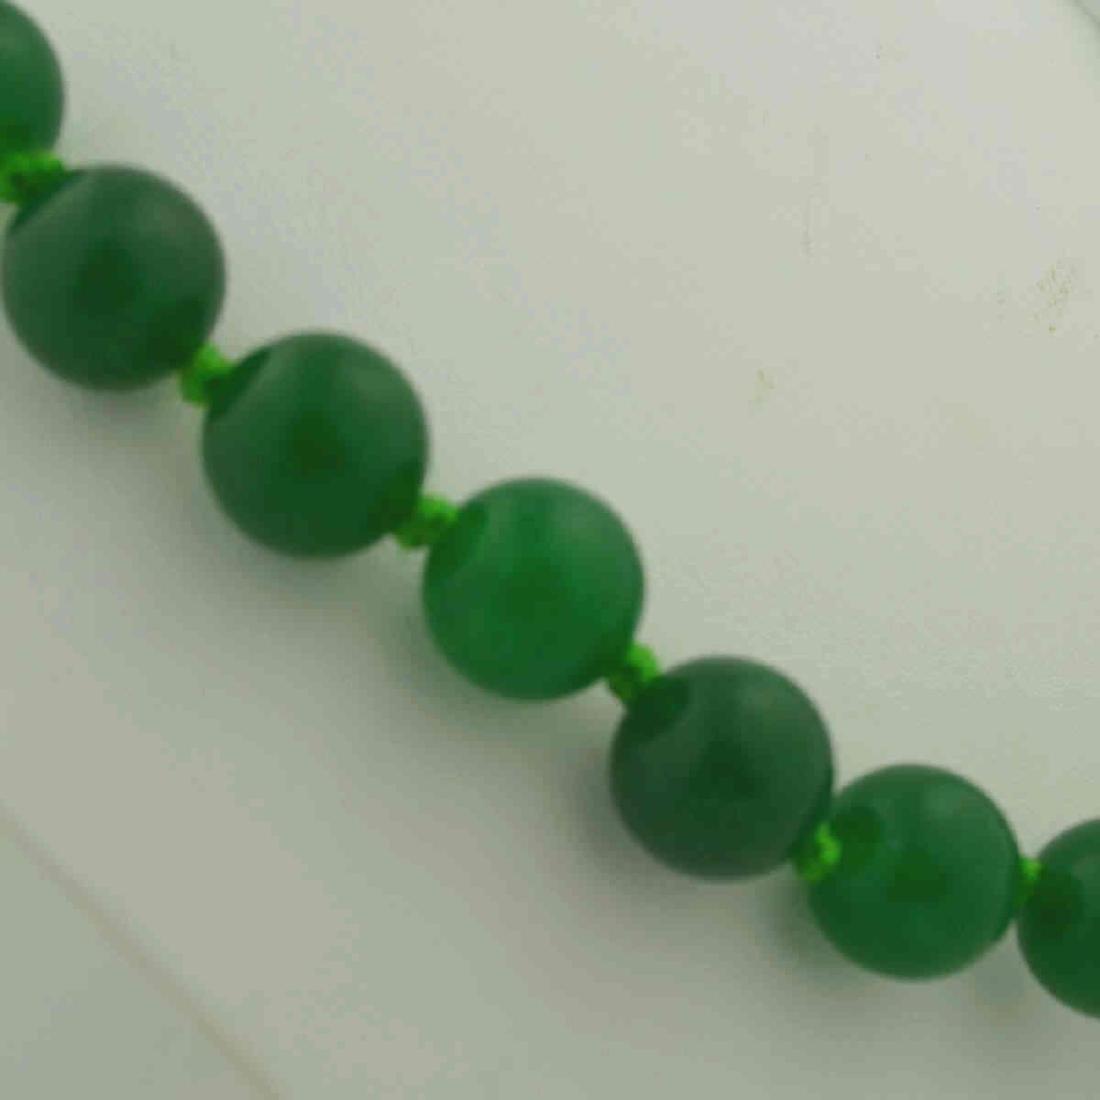 Green Quart Bead Necklace - 3